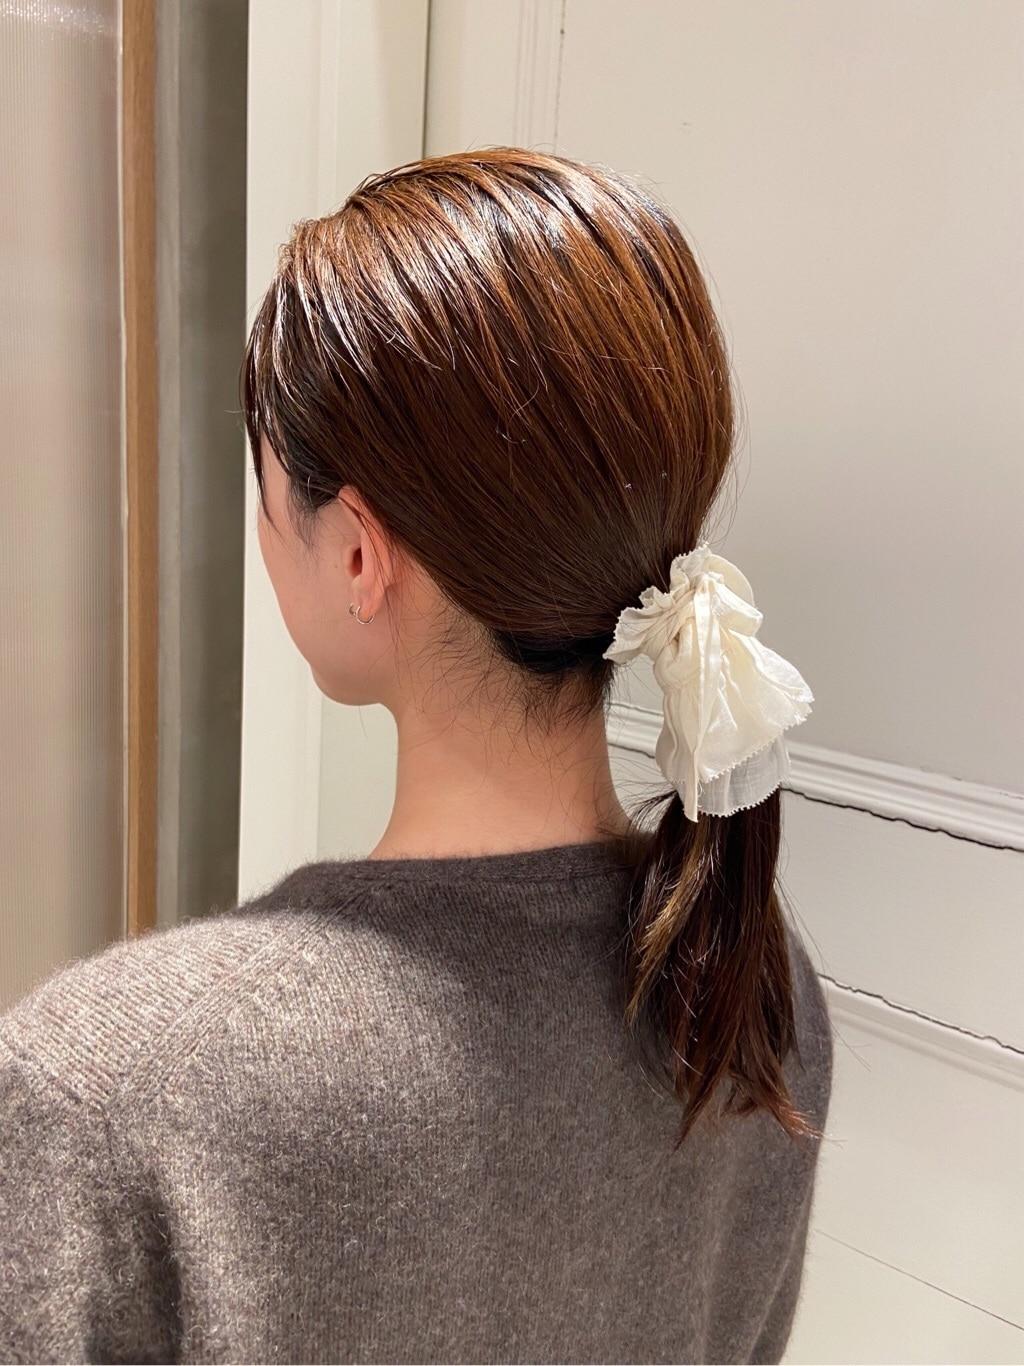 bulle de savon 渋谷スクランブルスクエア 身長:153cm 2020.11.11